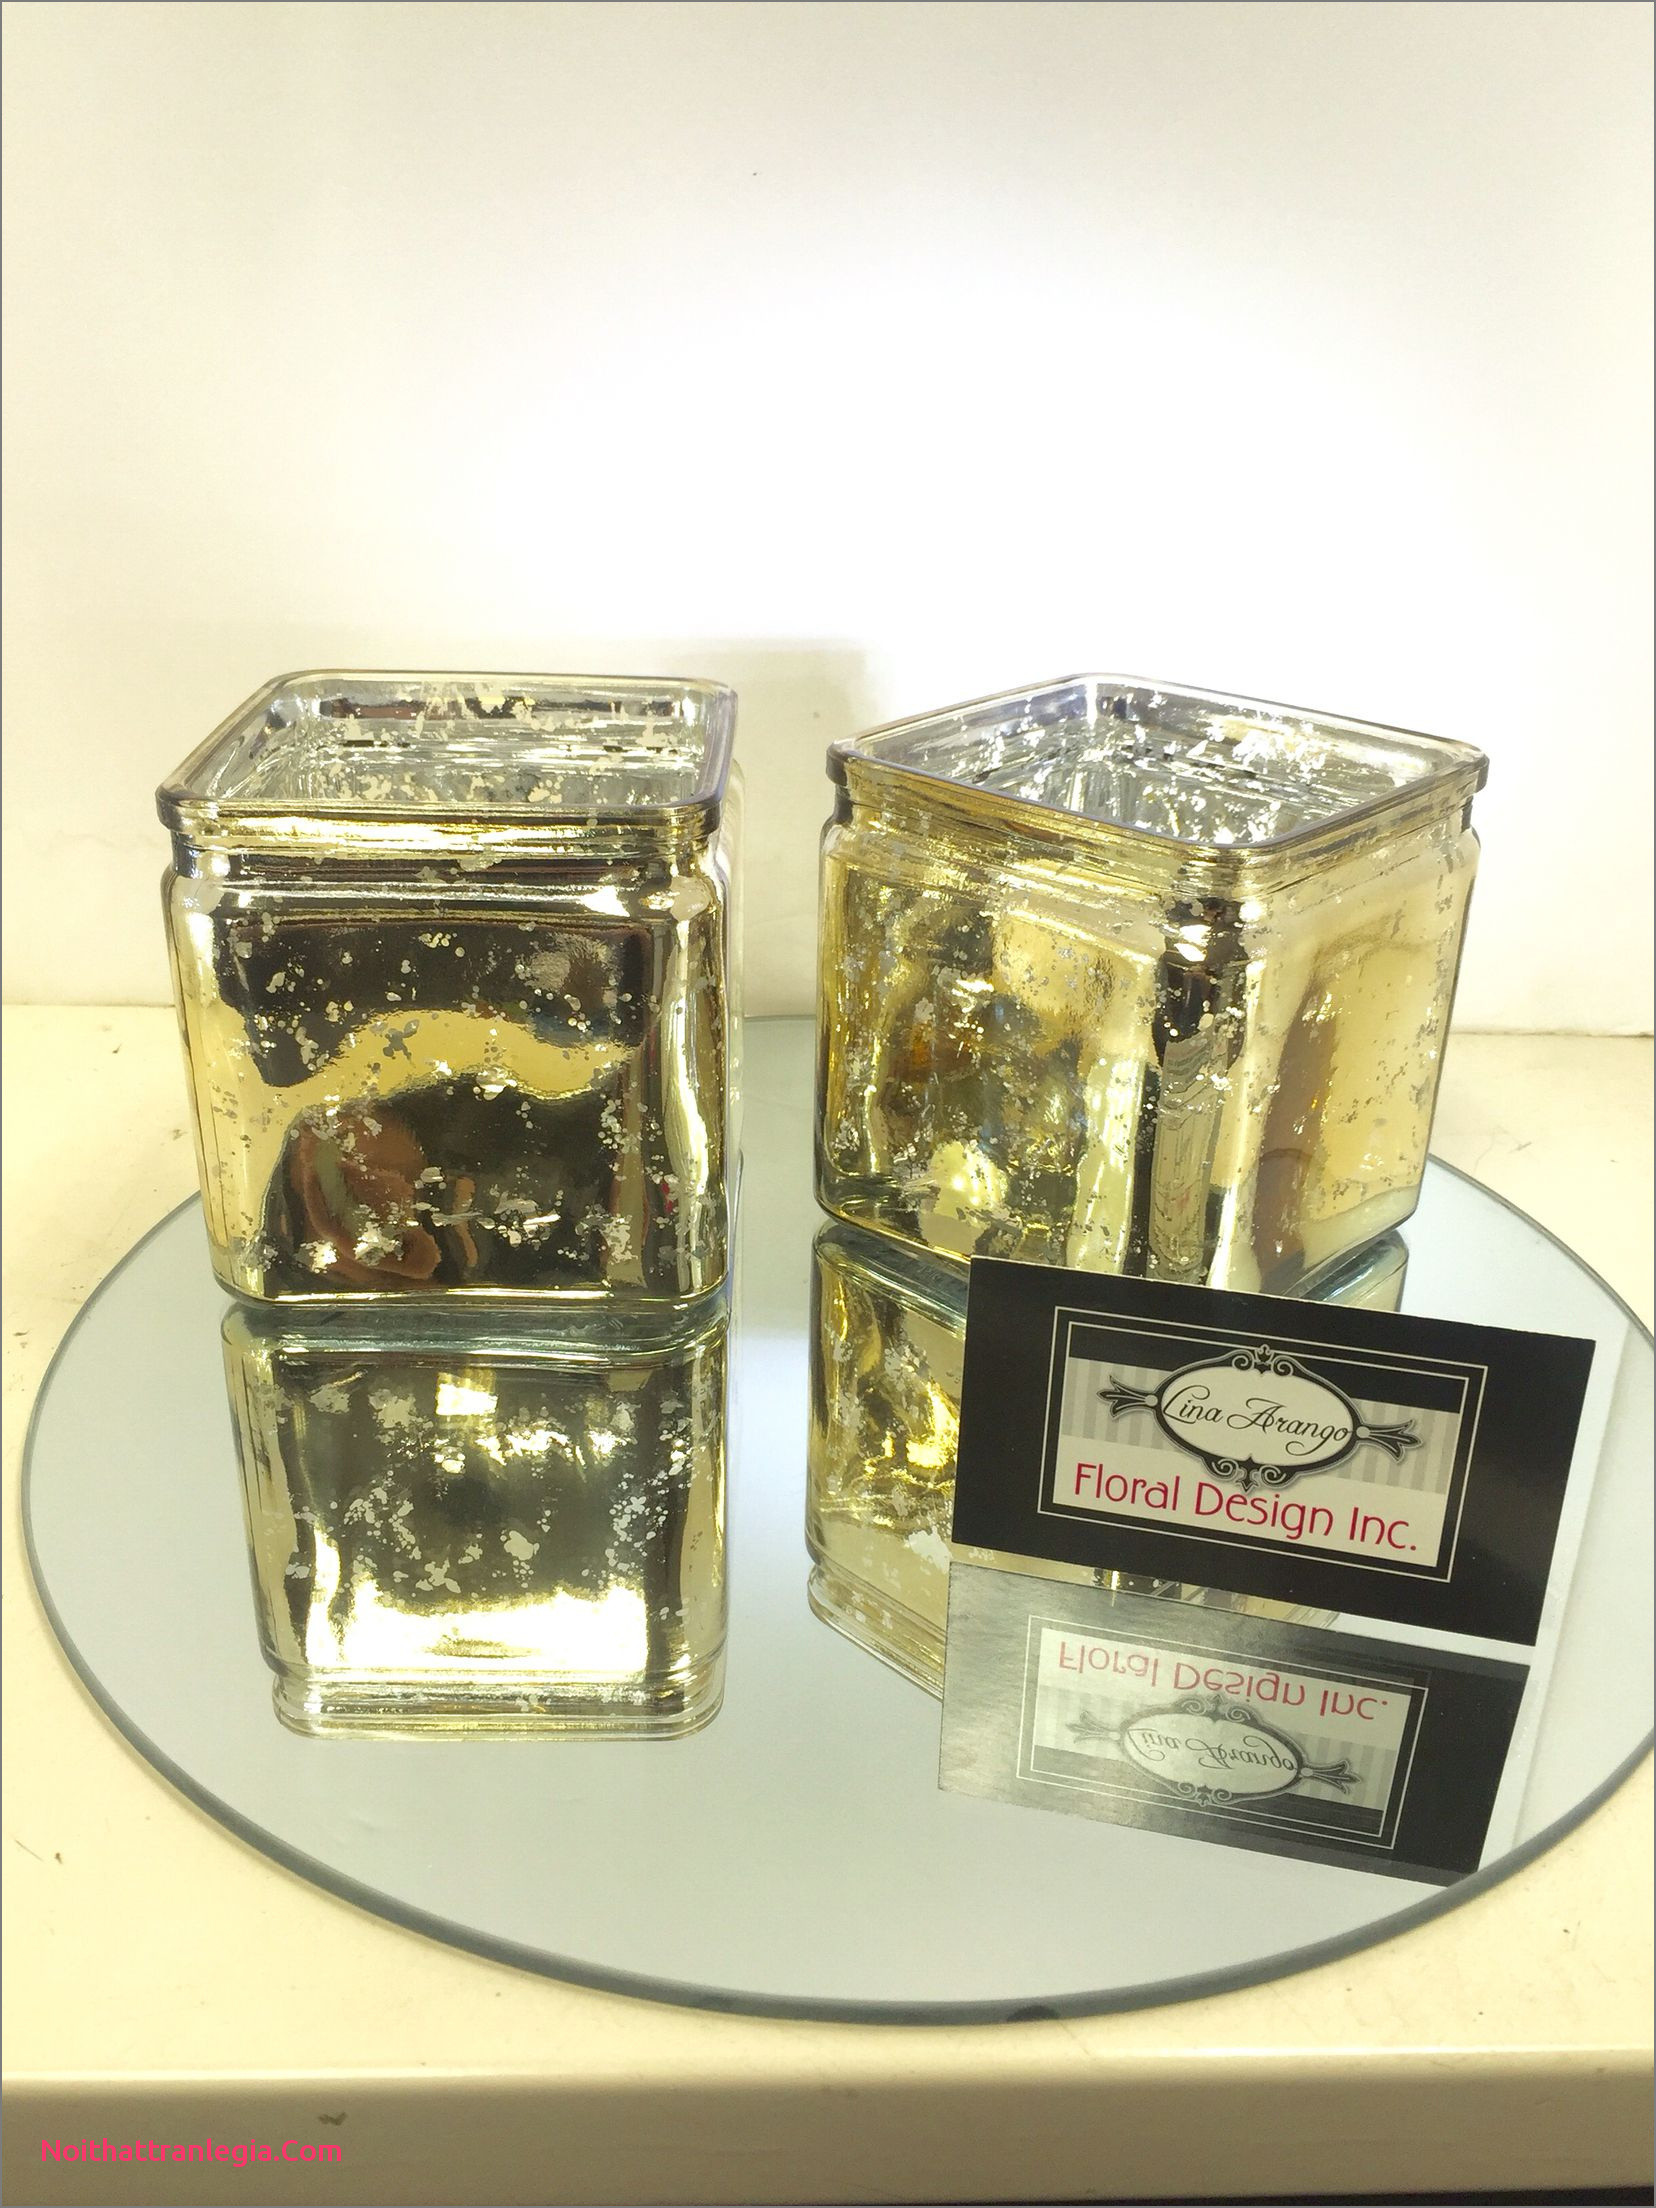 mirror mosaic vases for sale of 20 how to make mercury glass vases noithattranlegia vases design for gold mercury glass square vases on sale